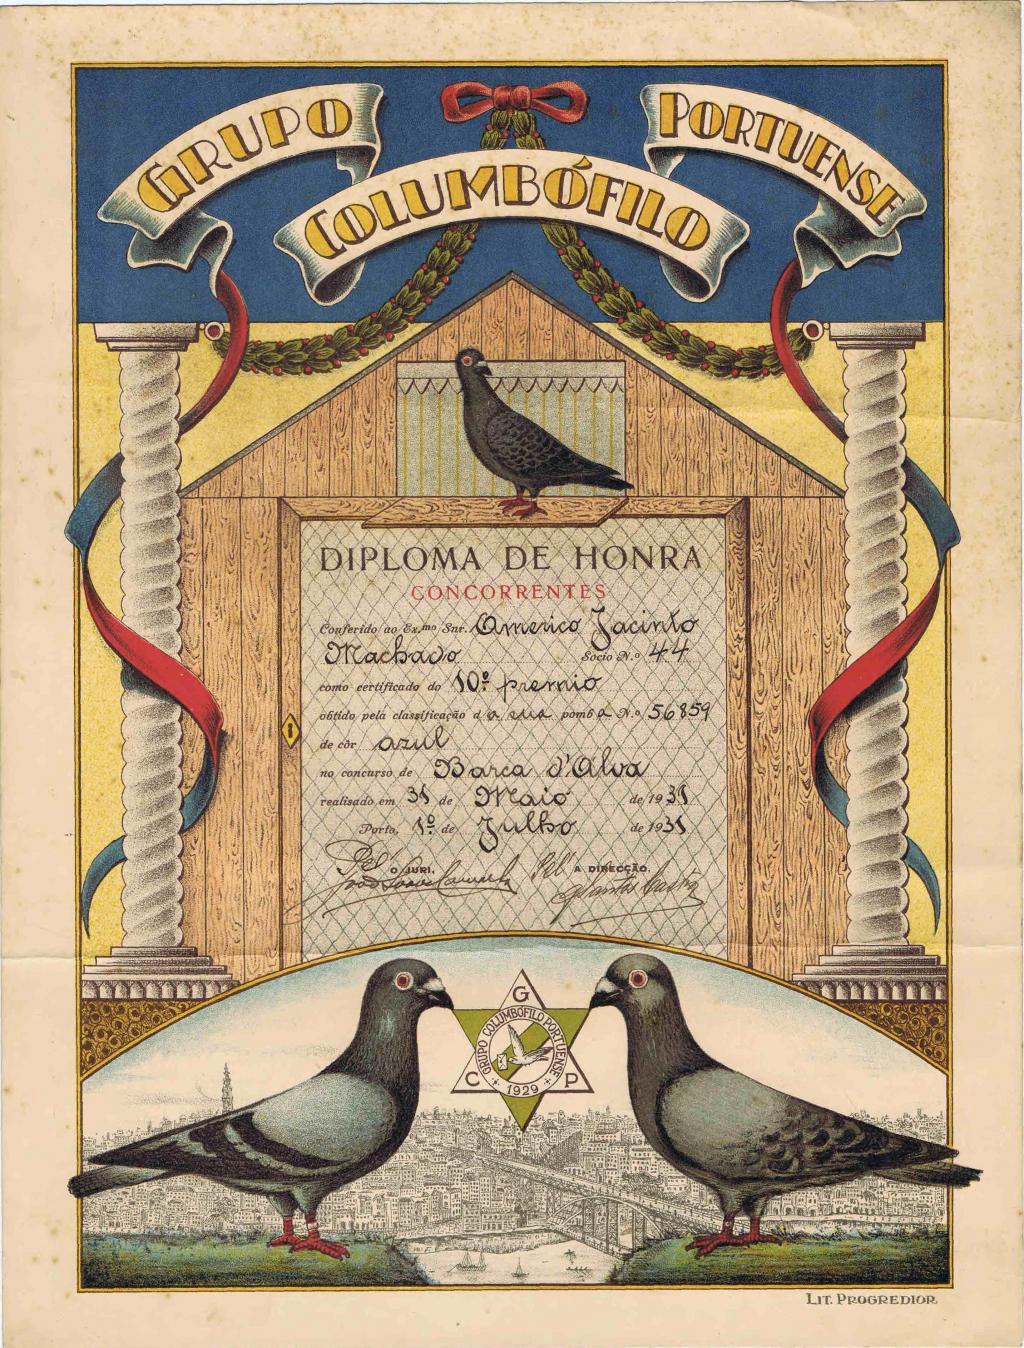 Arquivo Ephemera: columbofilia (anos 30)